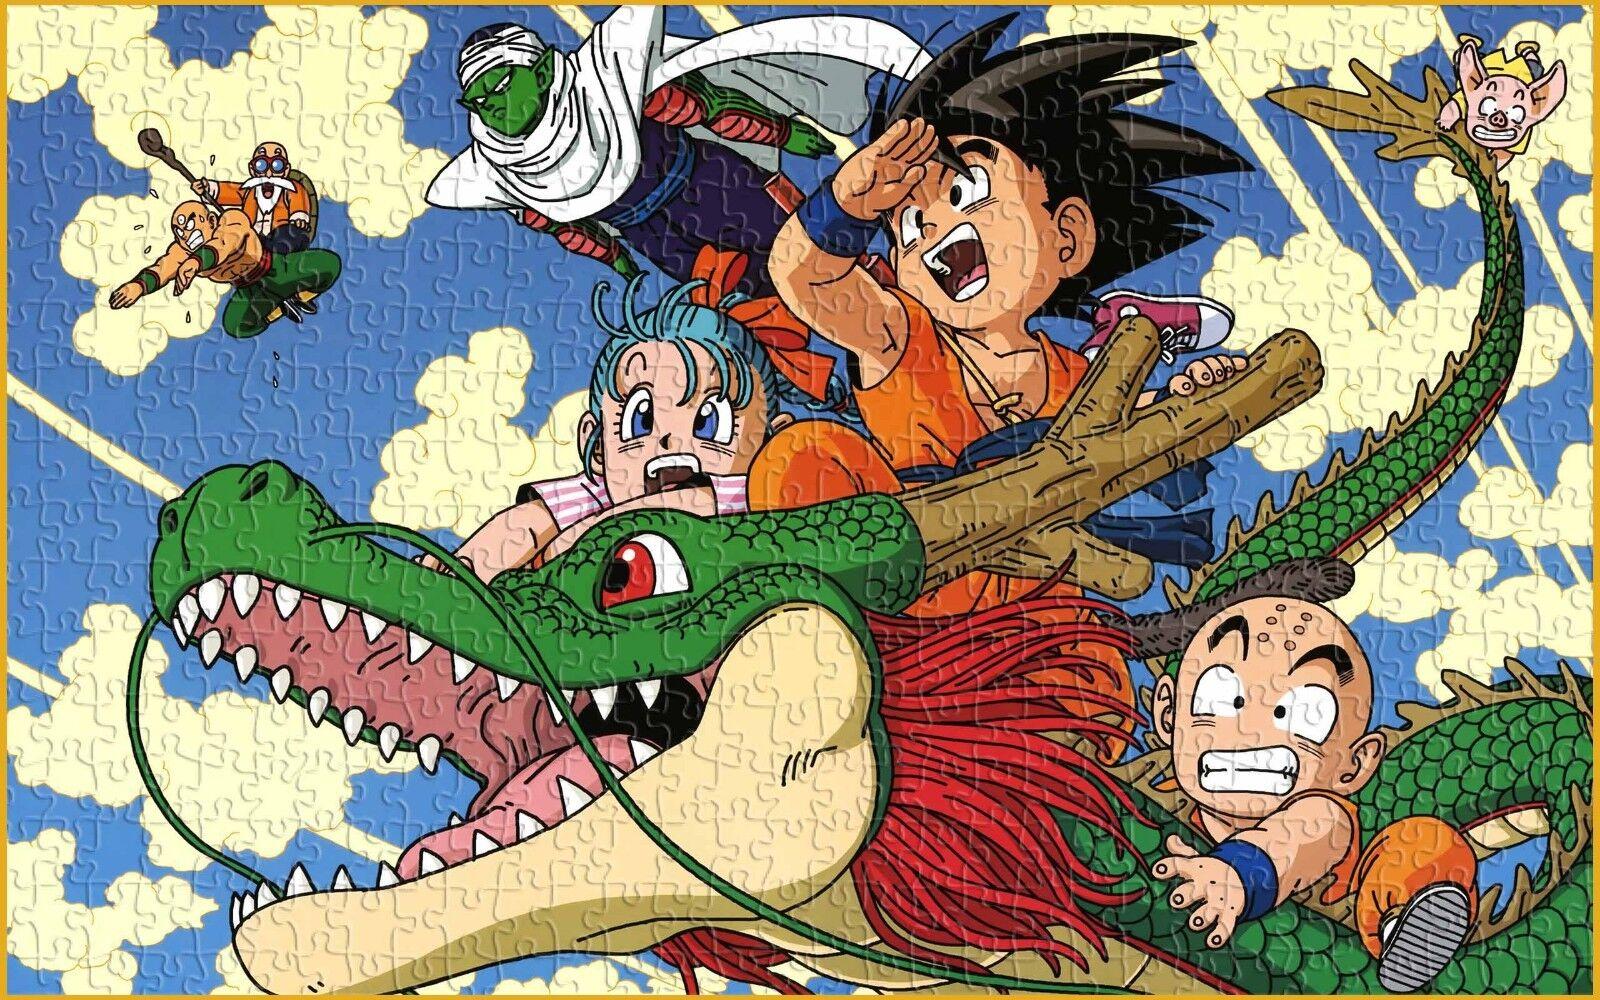 DBZ Goku Kids Dragon Ball Z Kuririn Anime Toys Japan JP Puzzle Jigsaws 1000 pcs